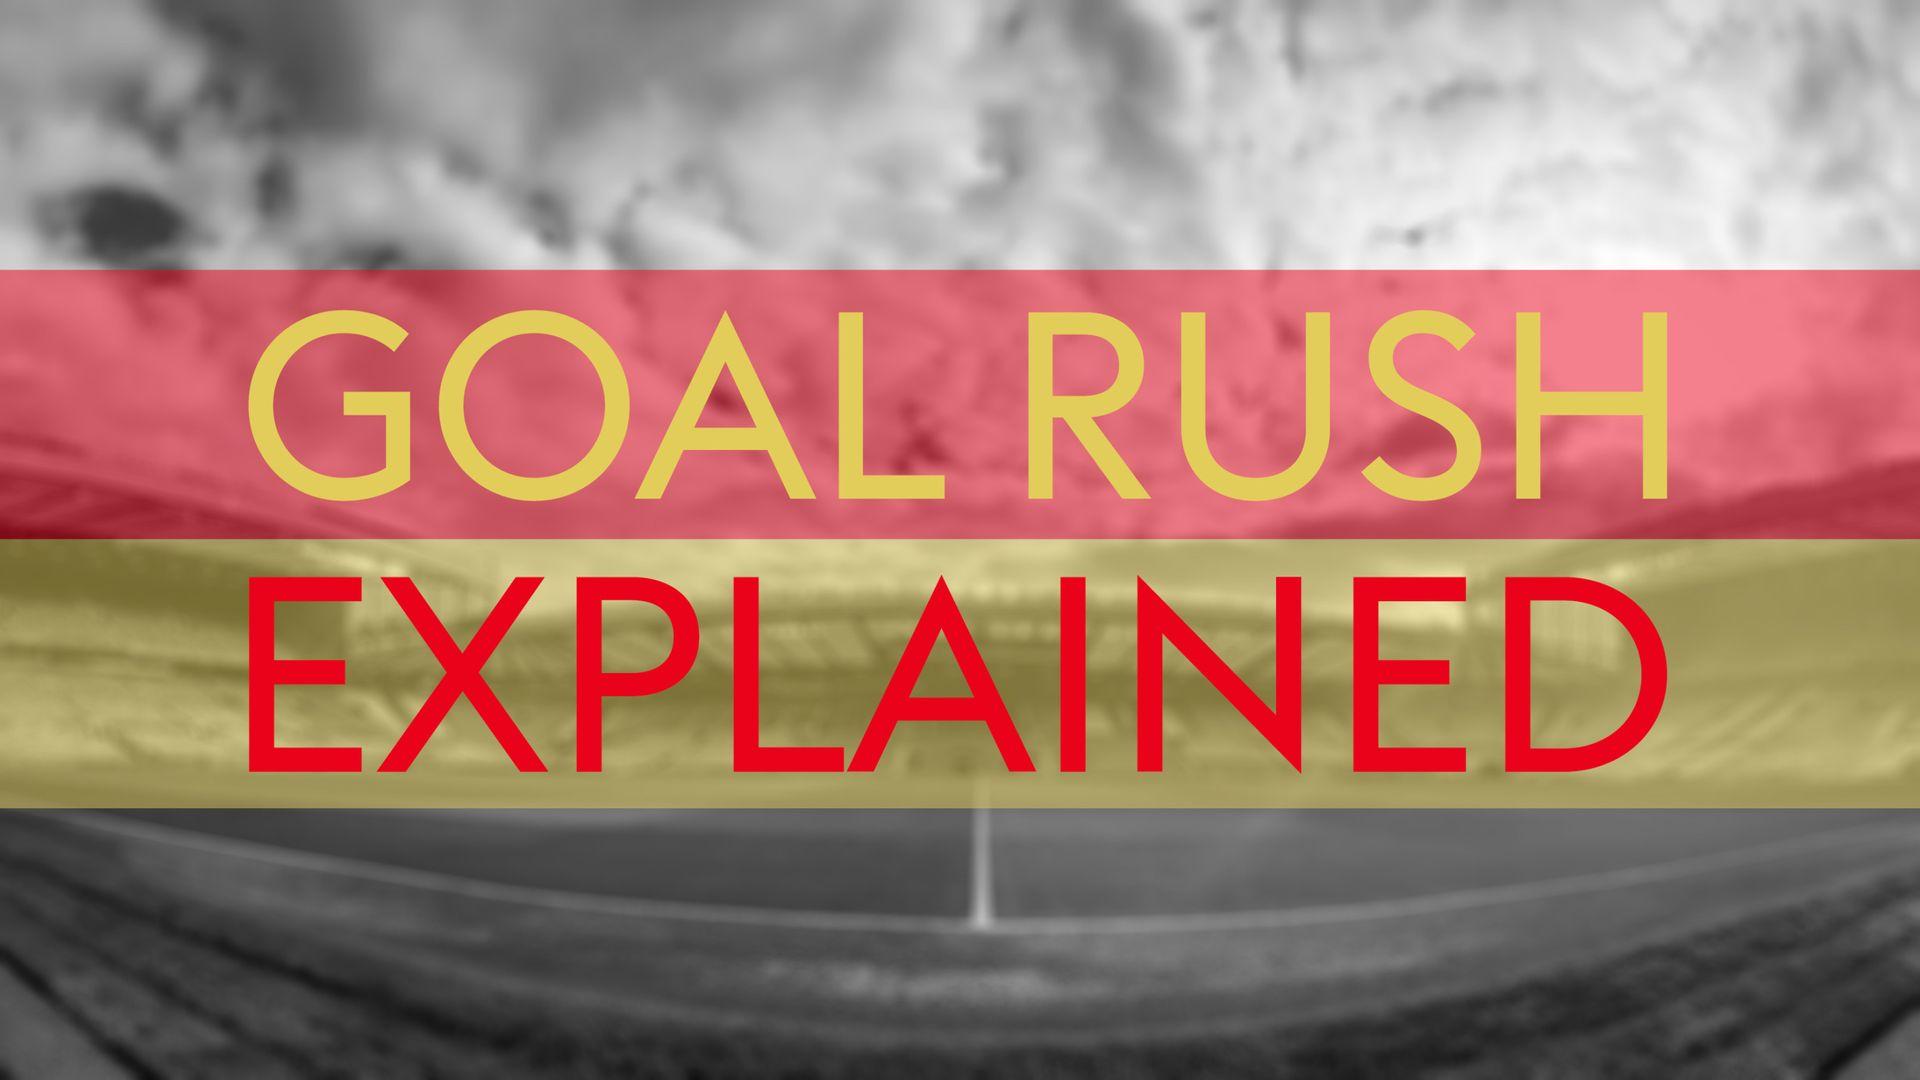 The goal rush explained